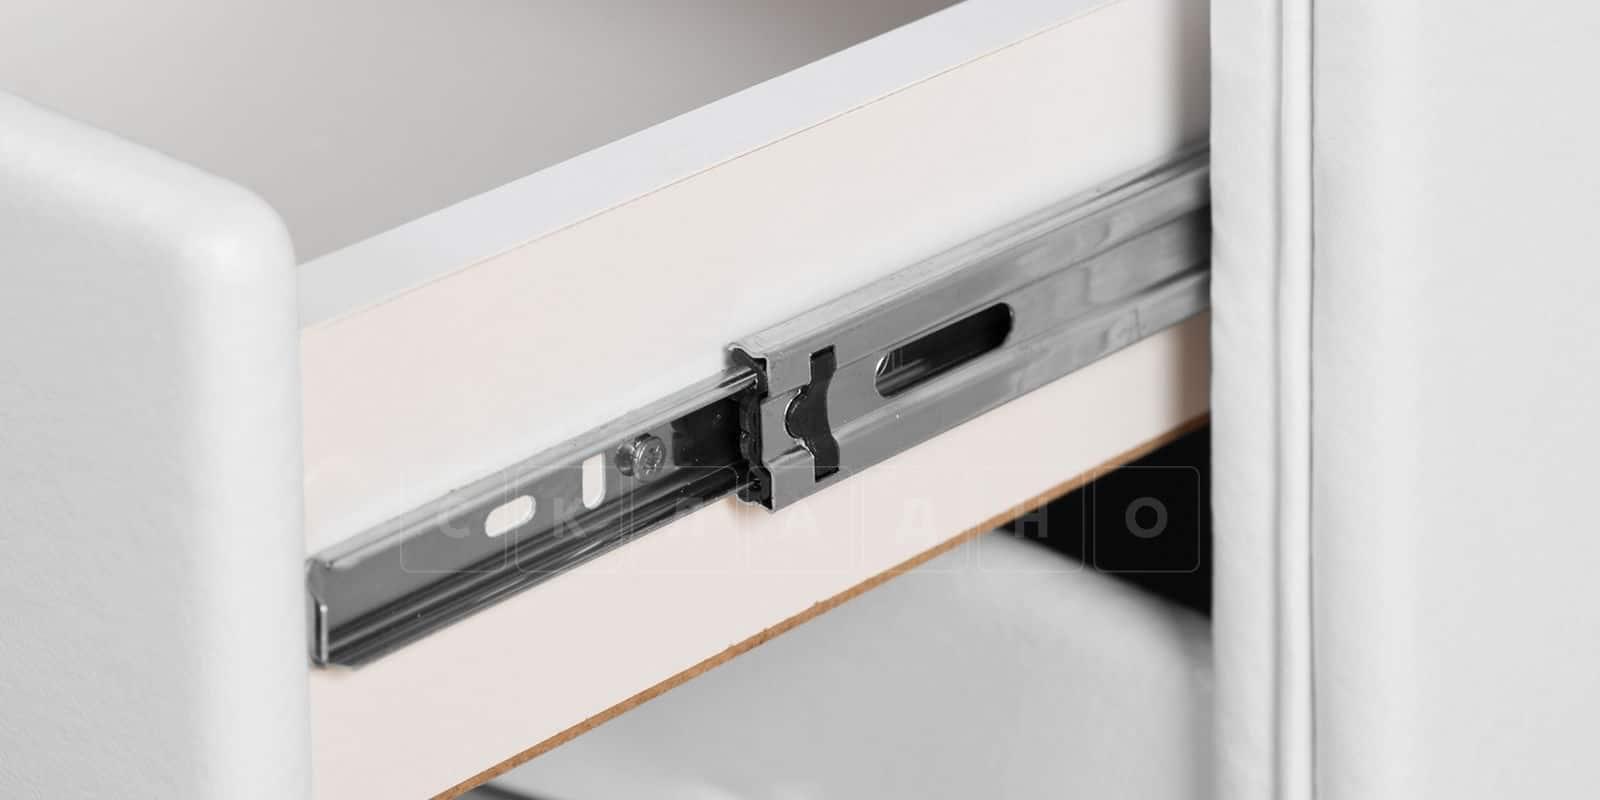 Прикроватная тумба Малибу 3 ящика фото 4   интернет-магазин Складно